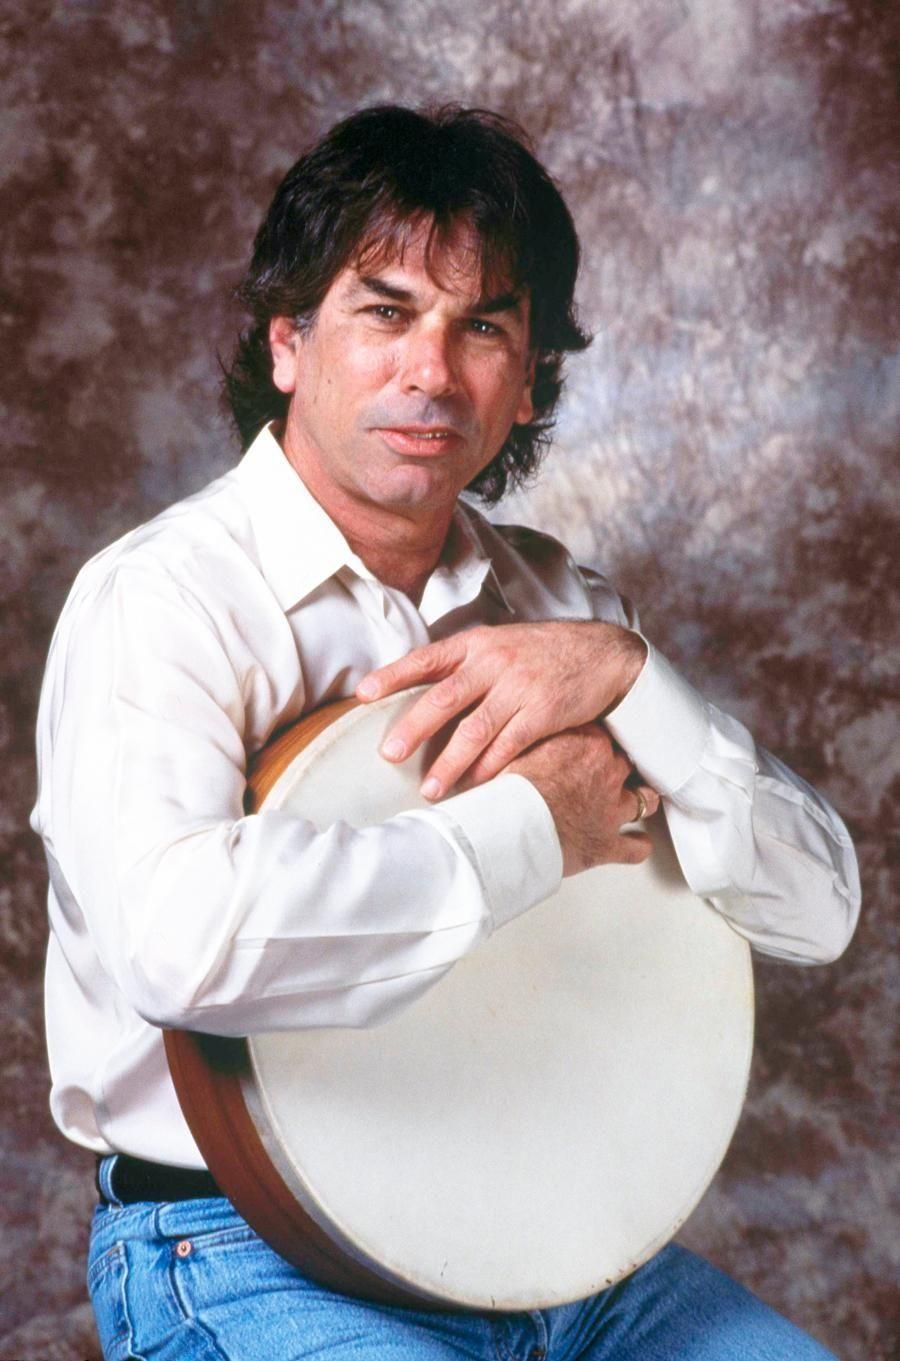 Former Grateful Dead drummer Mickey Hart was born